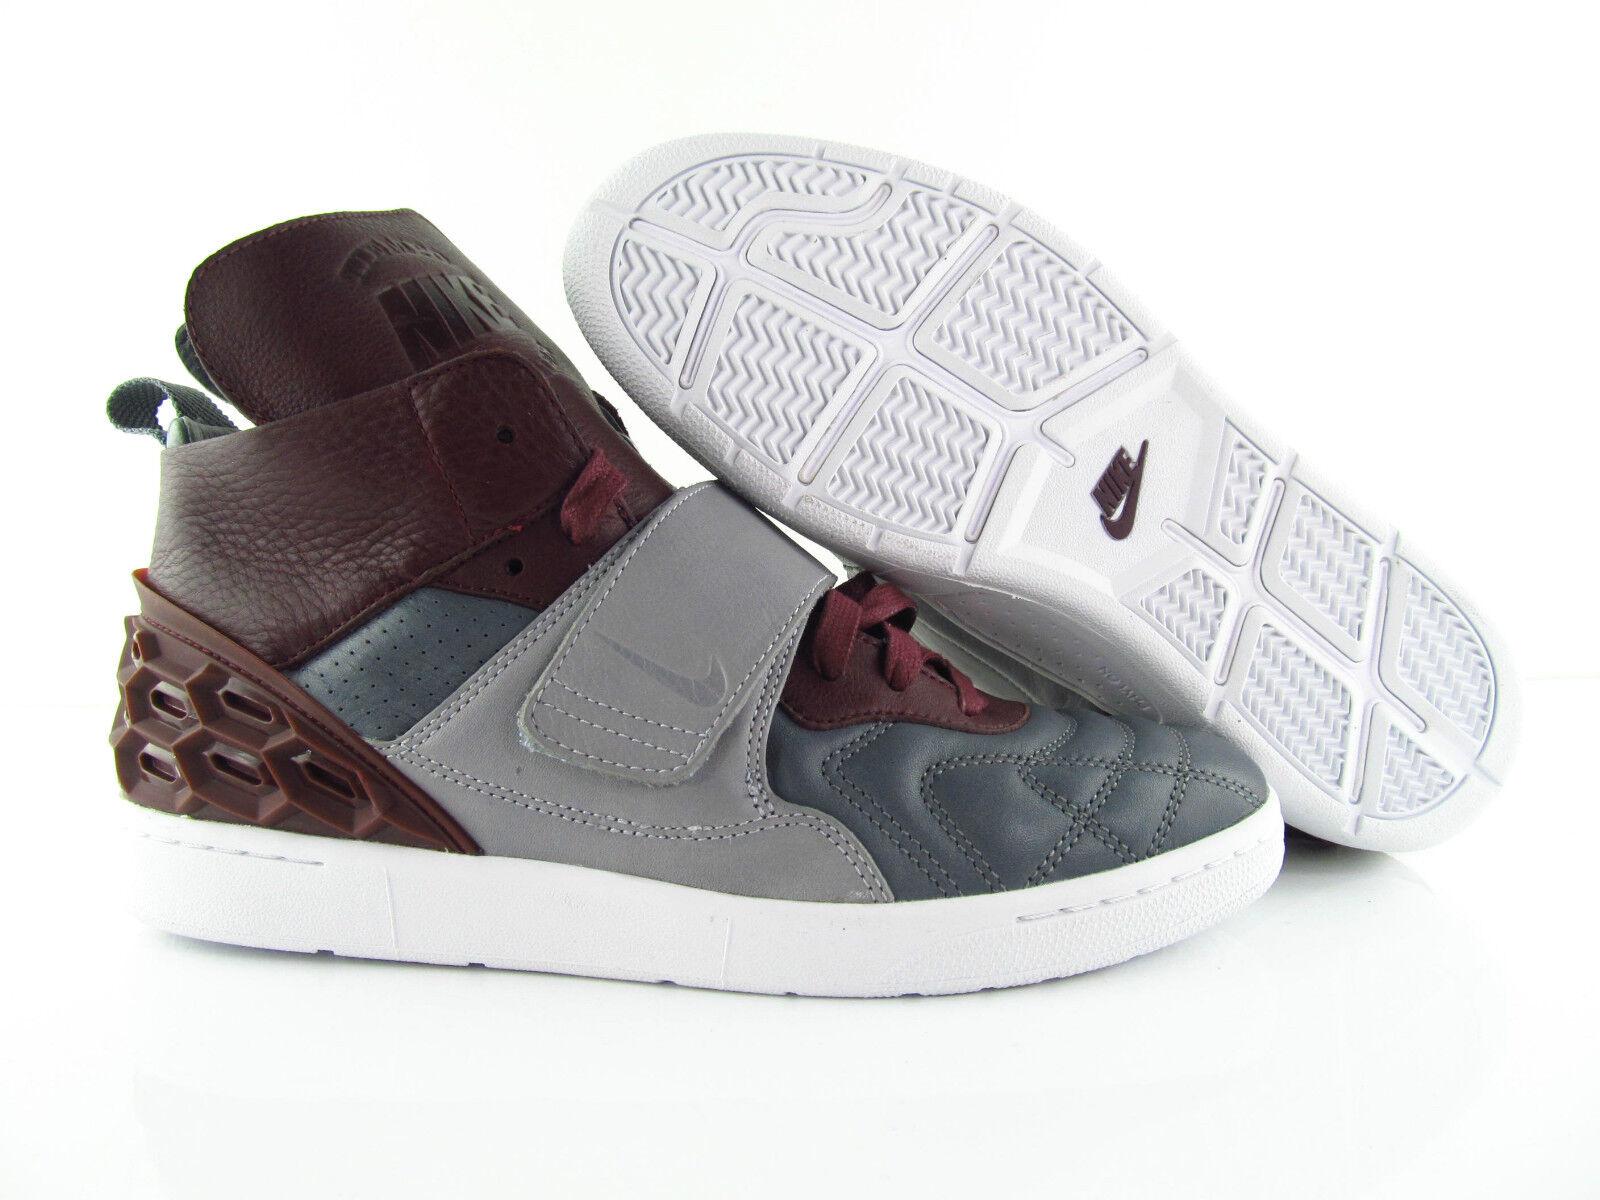 Nike Tieto VETTA QS Nikelab Wolf grigio Night Marroon rosso UK u 8 US _9 Eur _42.5